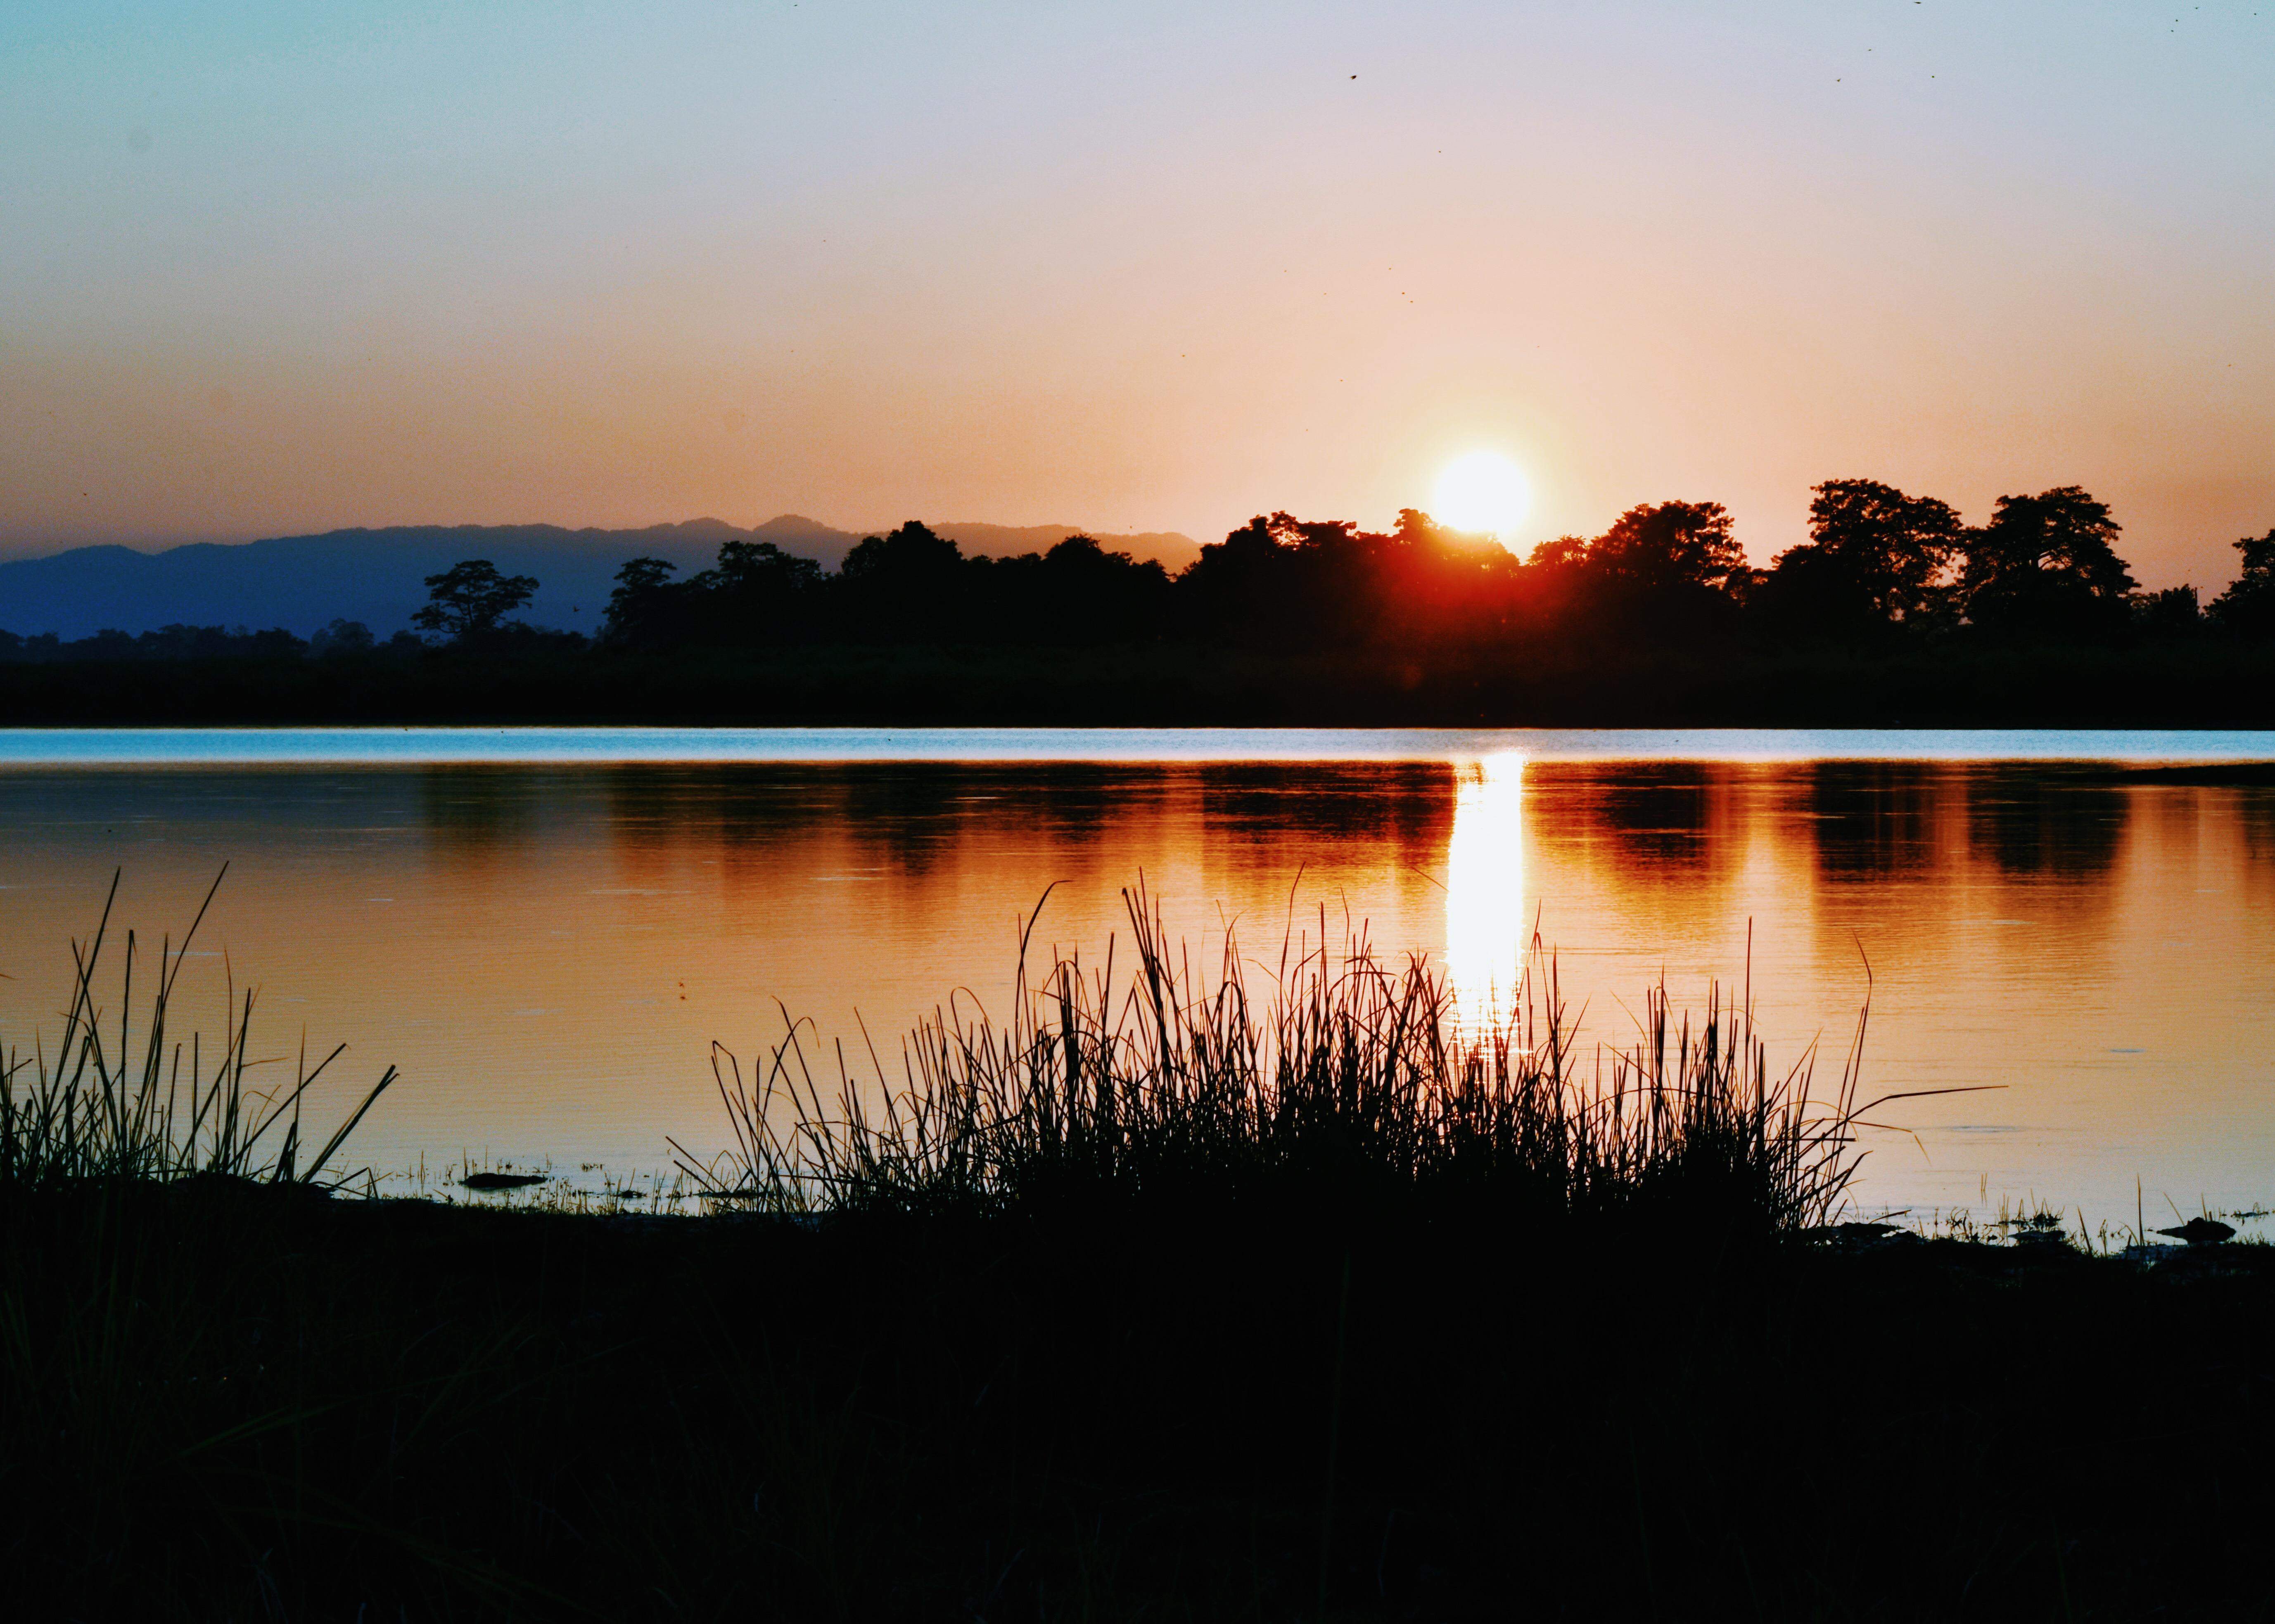 Brilliant sunset over Kaziranga